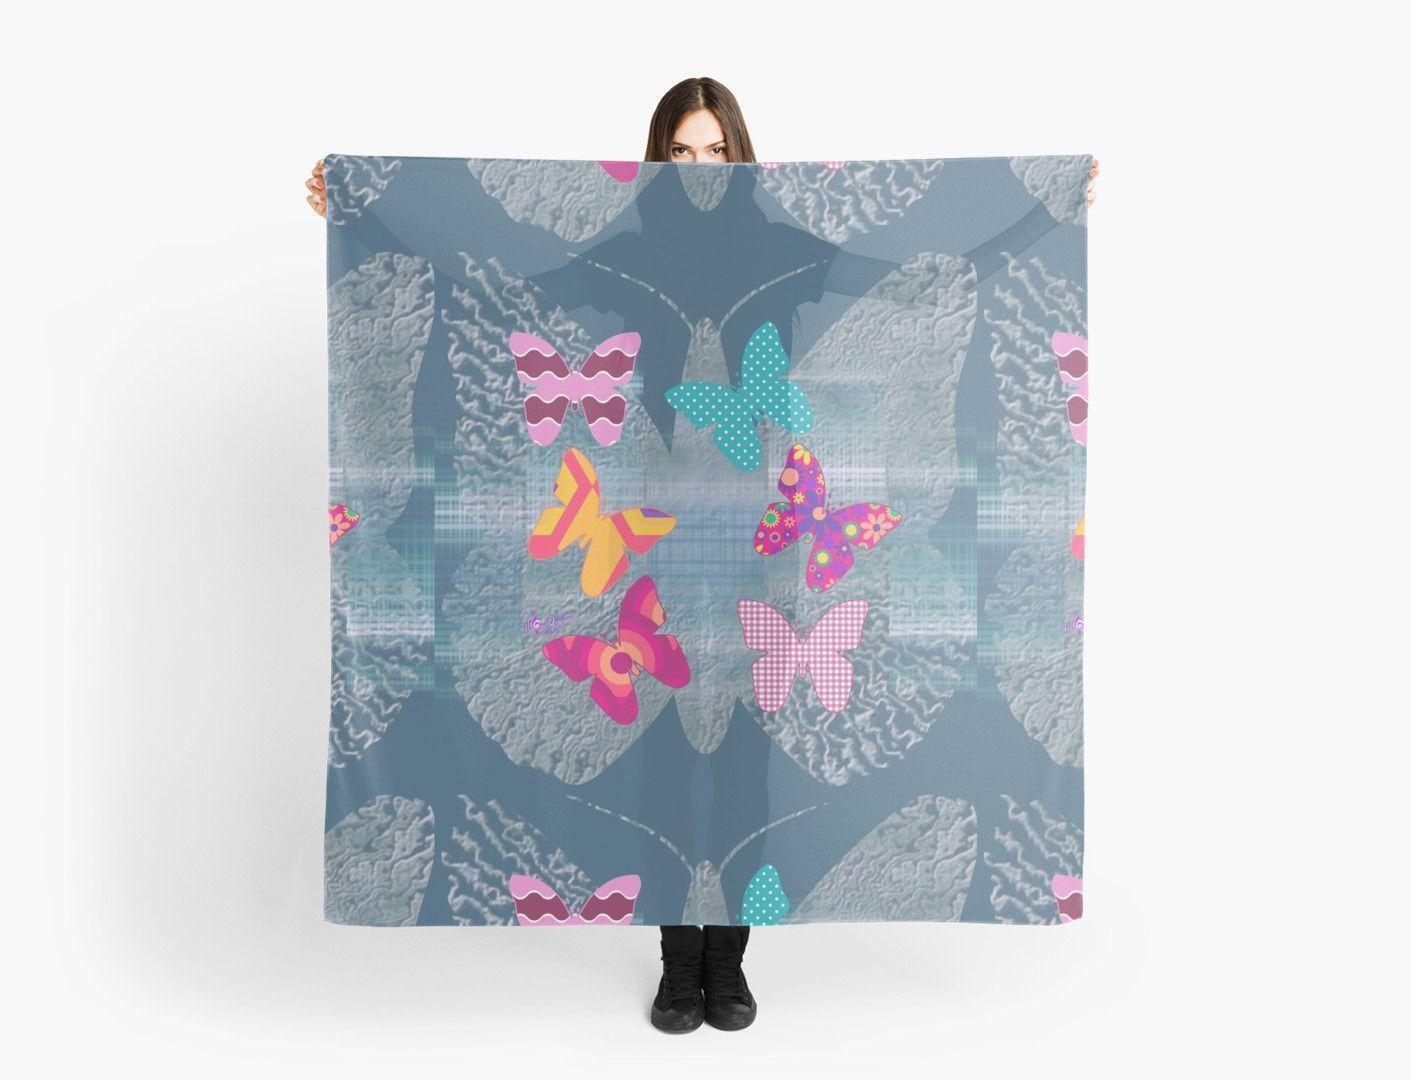 #ColorfulButterflies #InSilhouette #MatteChiffonScarf by #MoonDreamsMusic